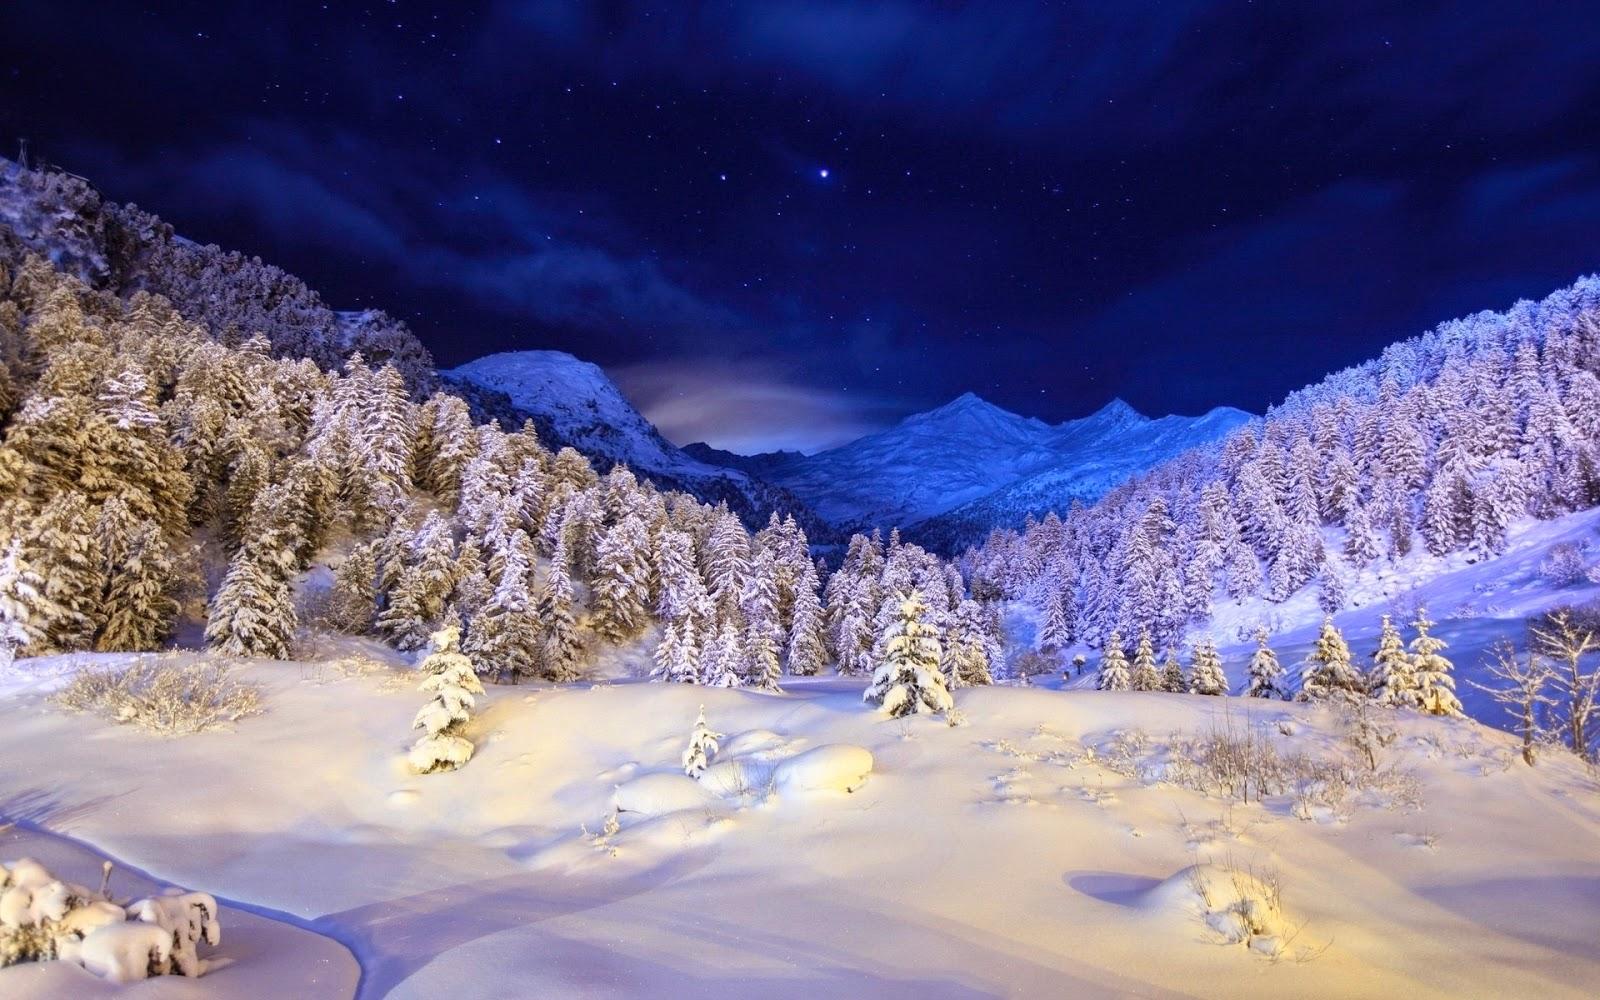 Paisajes de invierno fondos invierno fondos de pantalla for Paisajes para fondo de pantalla